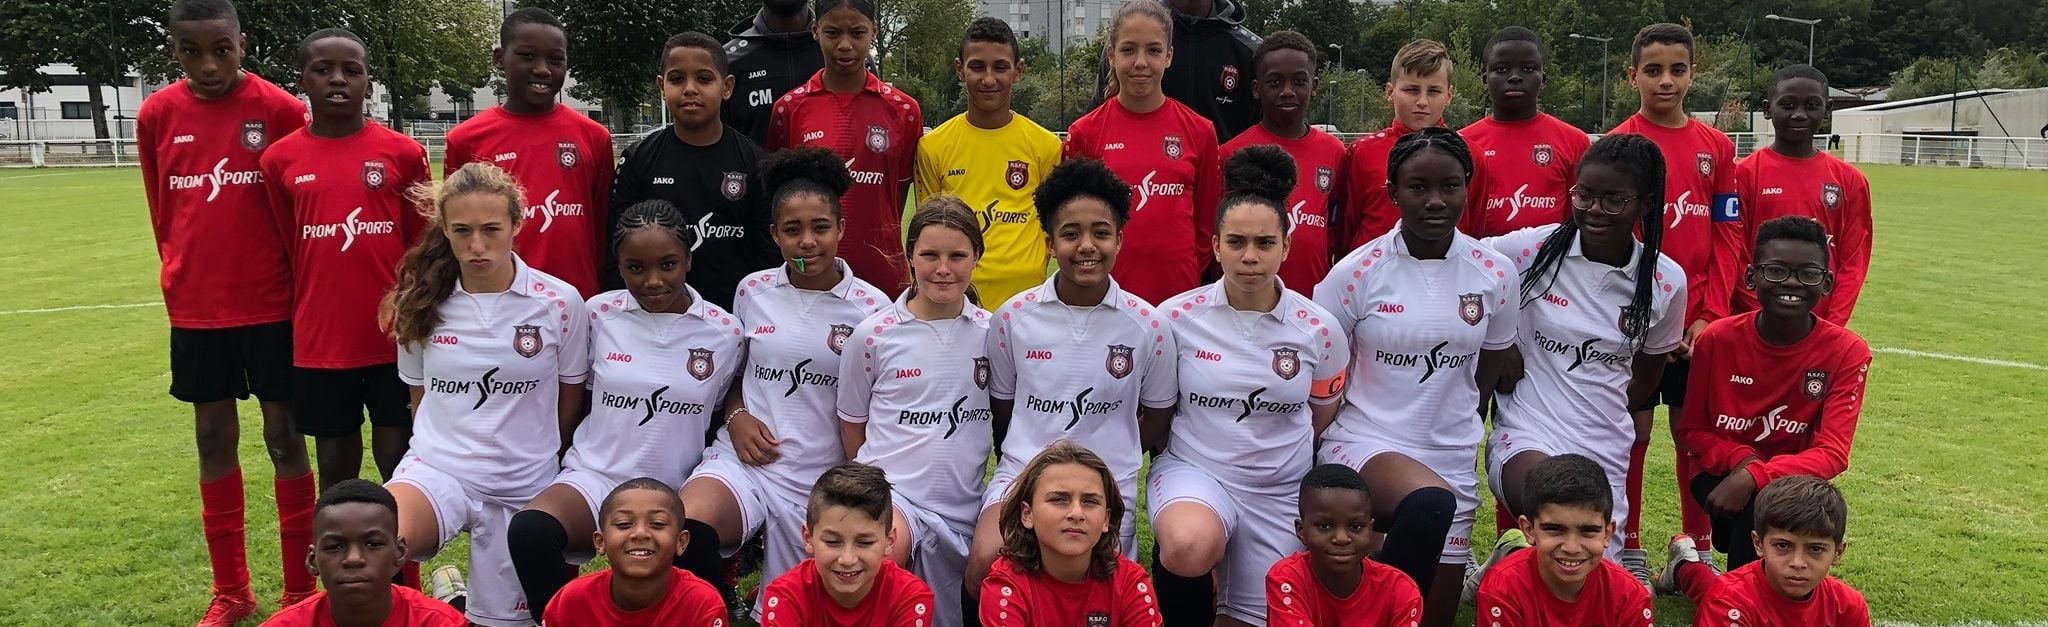 Rouen Sapins FC Grand Mare